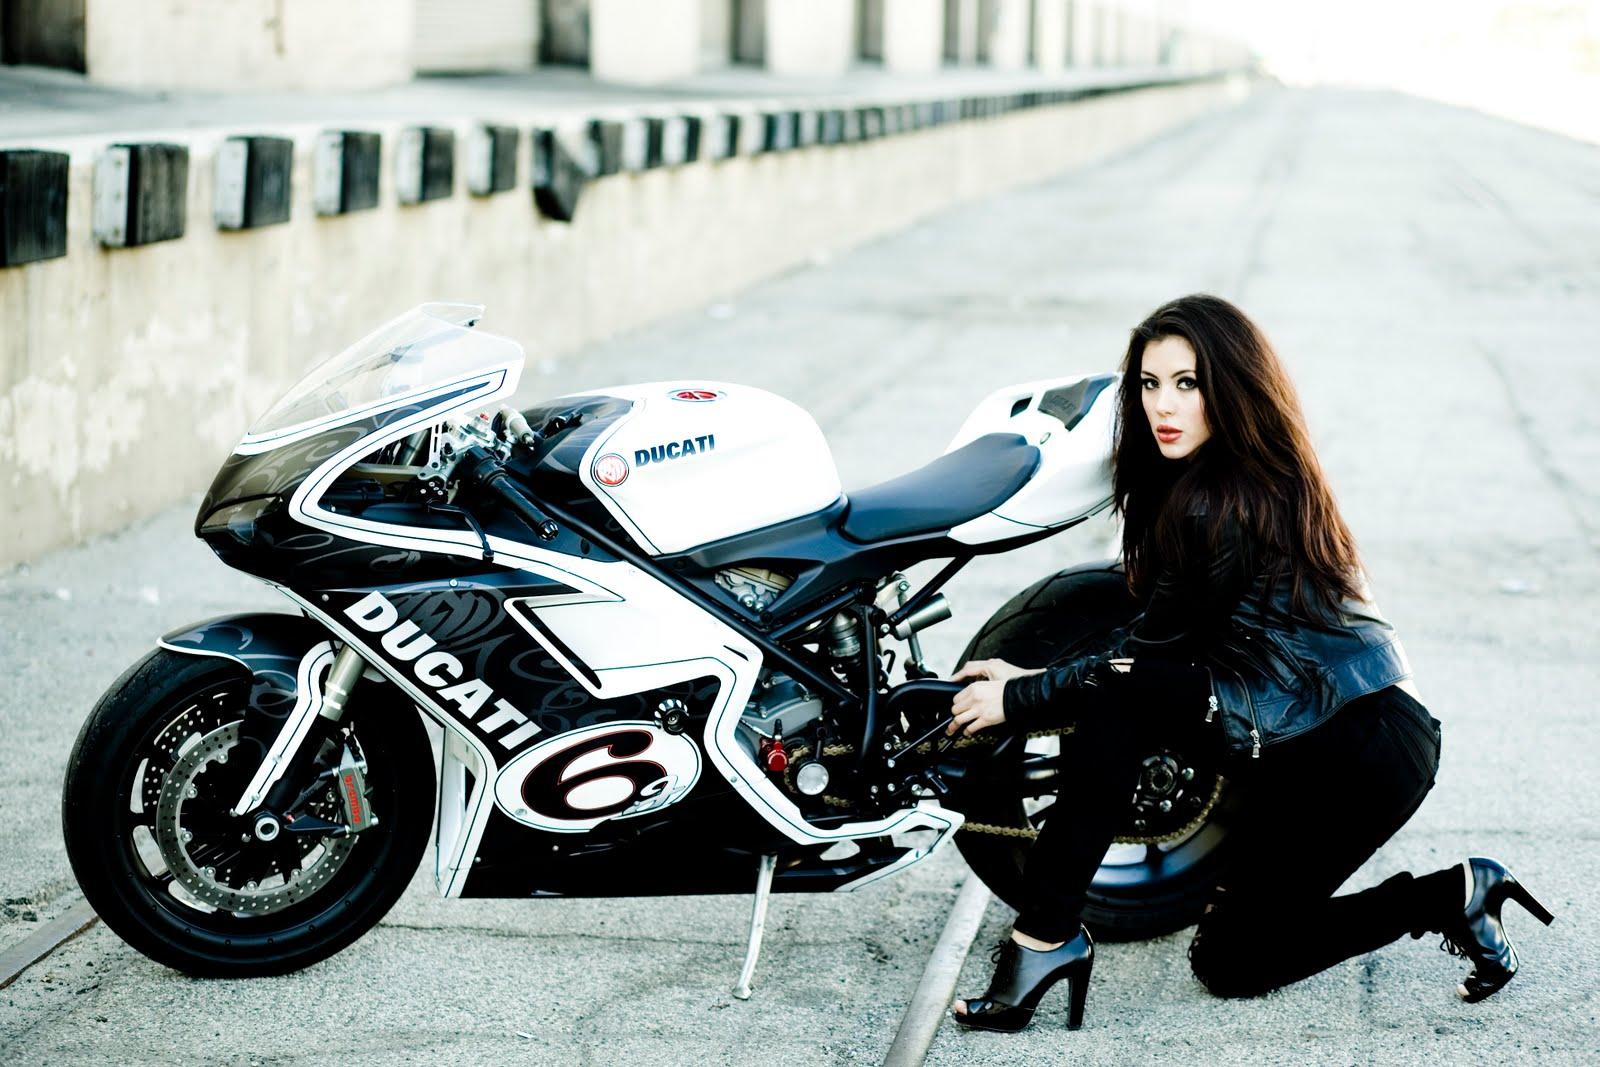 http://1.bp.blogspot.com/-Rc2Eq3HKWU8/Tef2sl3NoCI/AAAAAAAACFg/Q3JA_G64RJk/s1600/Bike%2BAnd%2BGirl%2BWallpaper.jpg